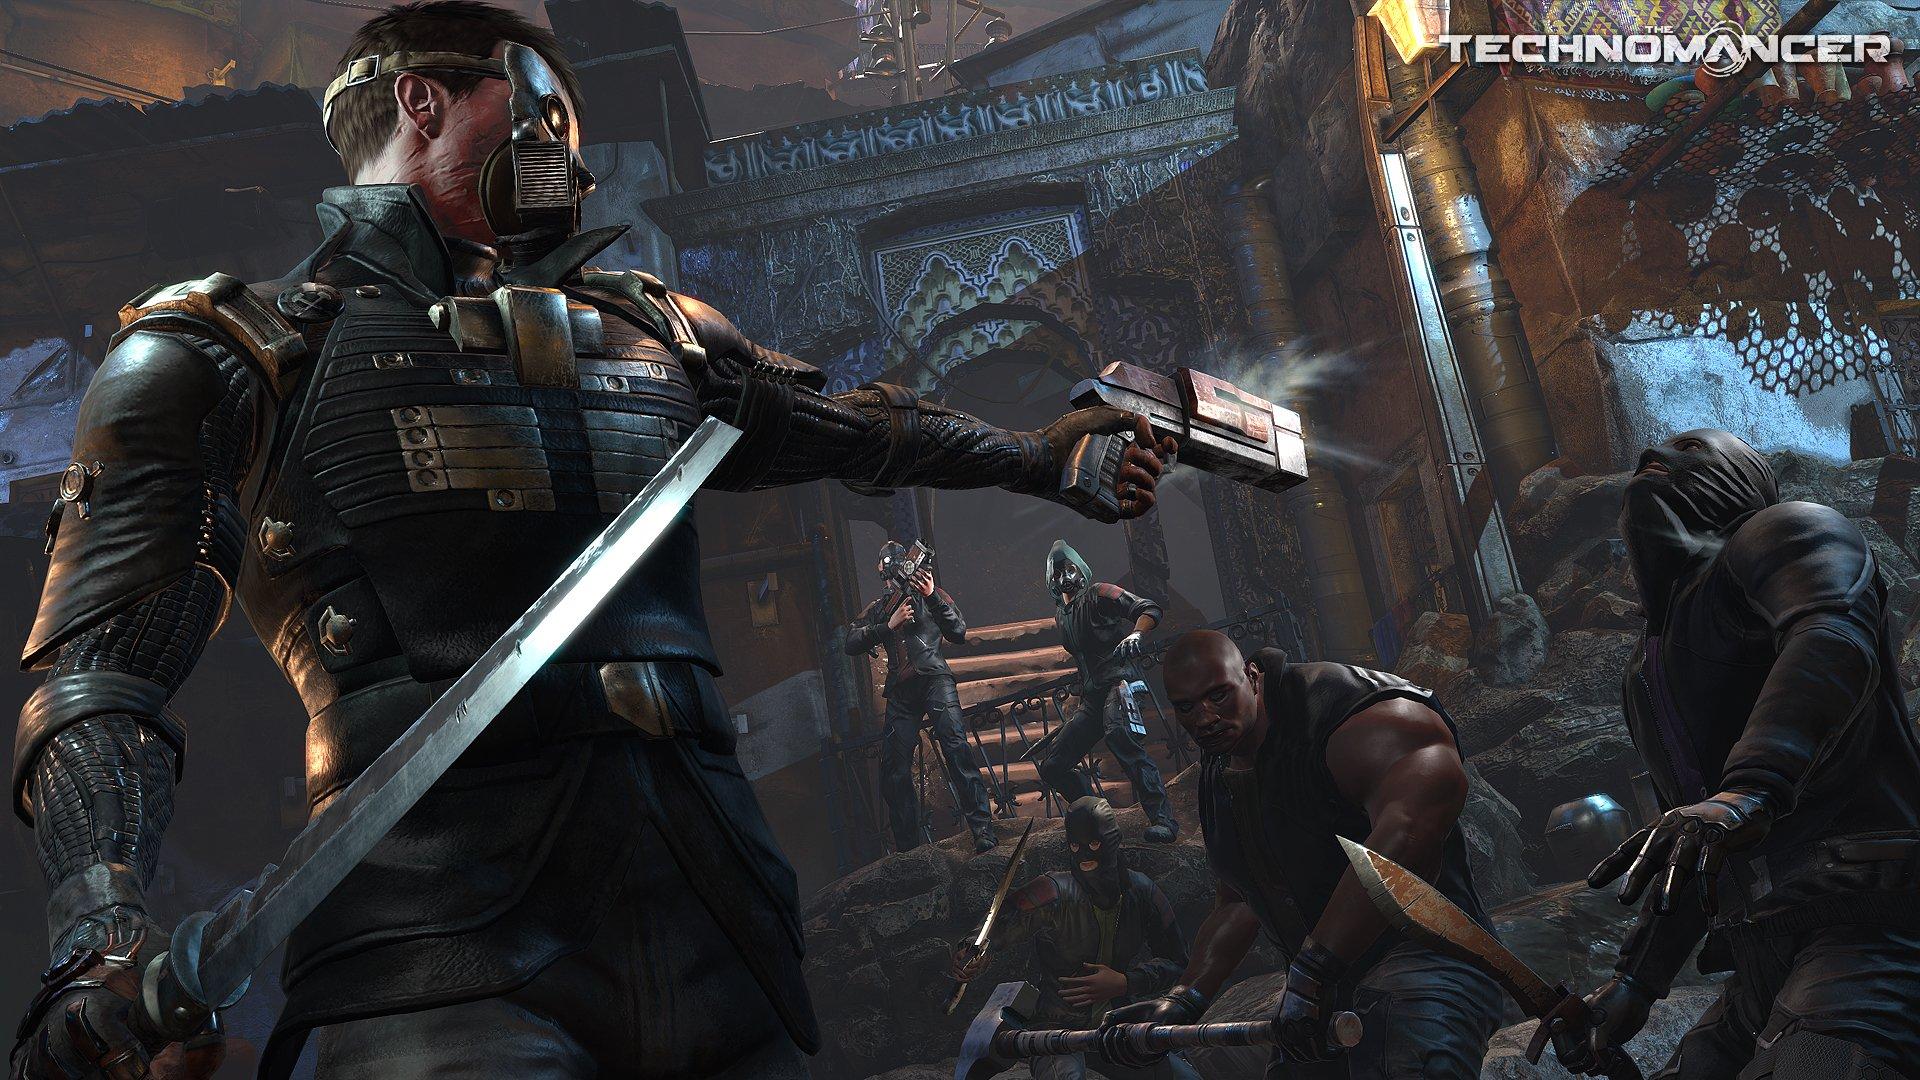 The Technomancer Screenshots ~ PS4, Xbox One & PC - Изображение 2